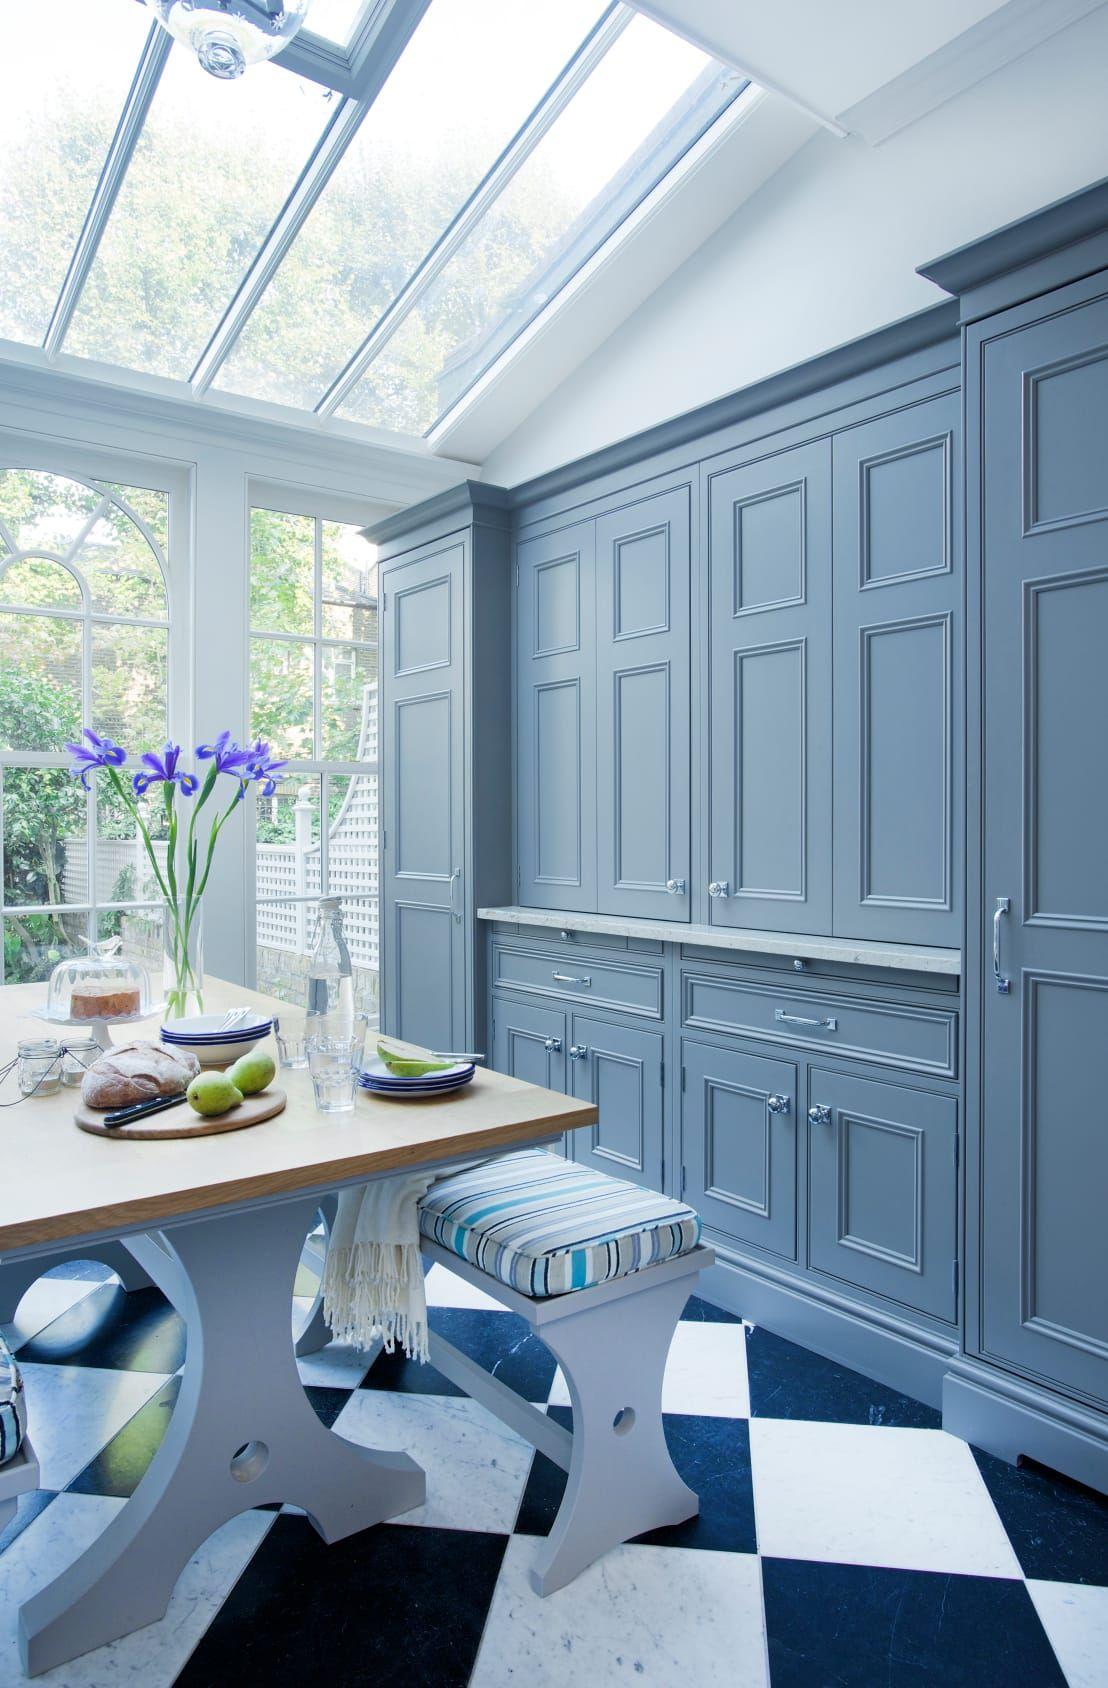 Home Decorating, Interior Design, Bath & Kitchen Ideas